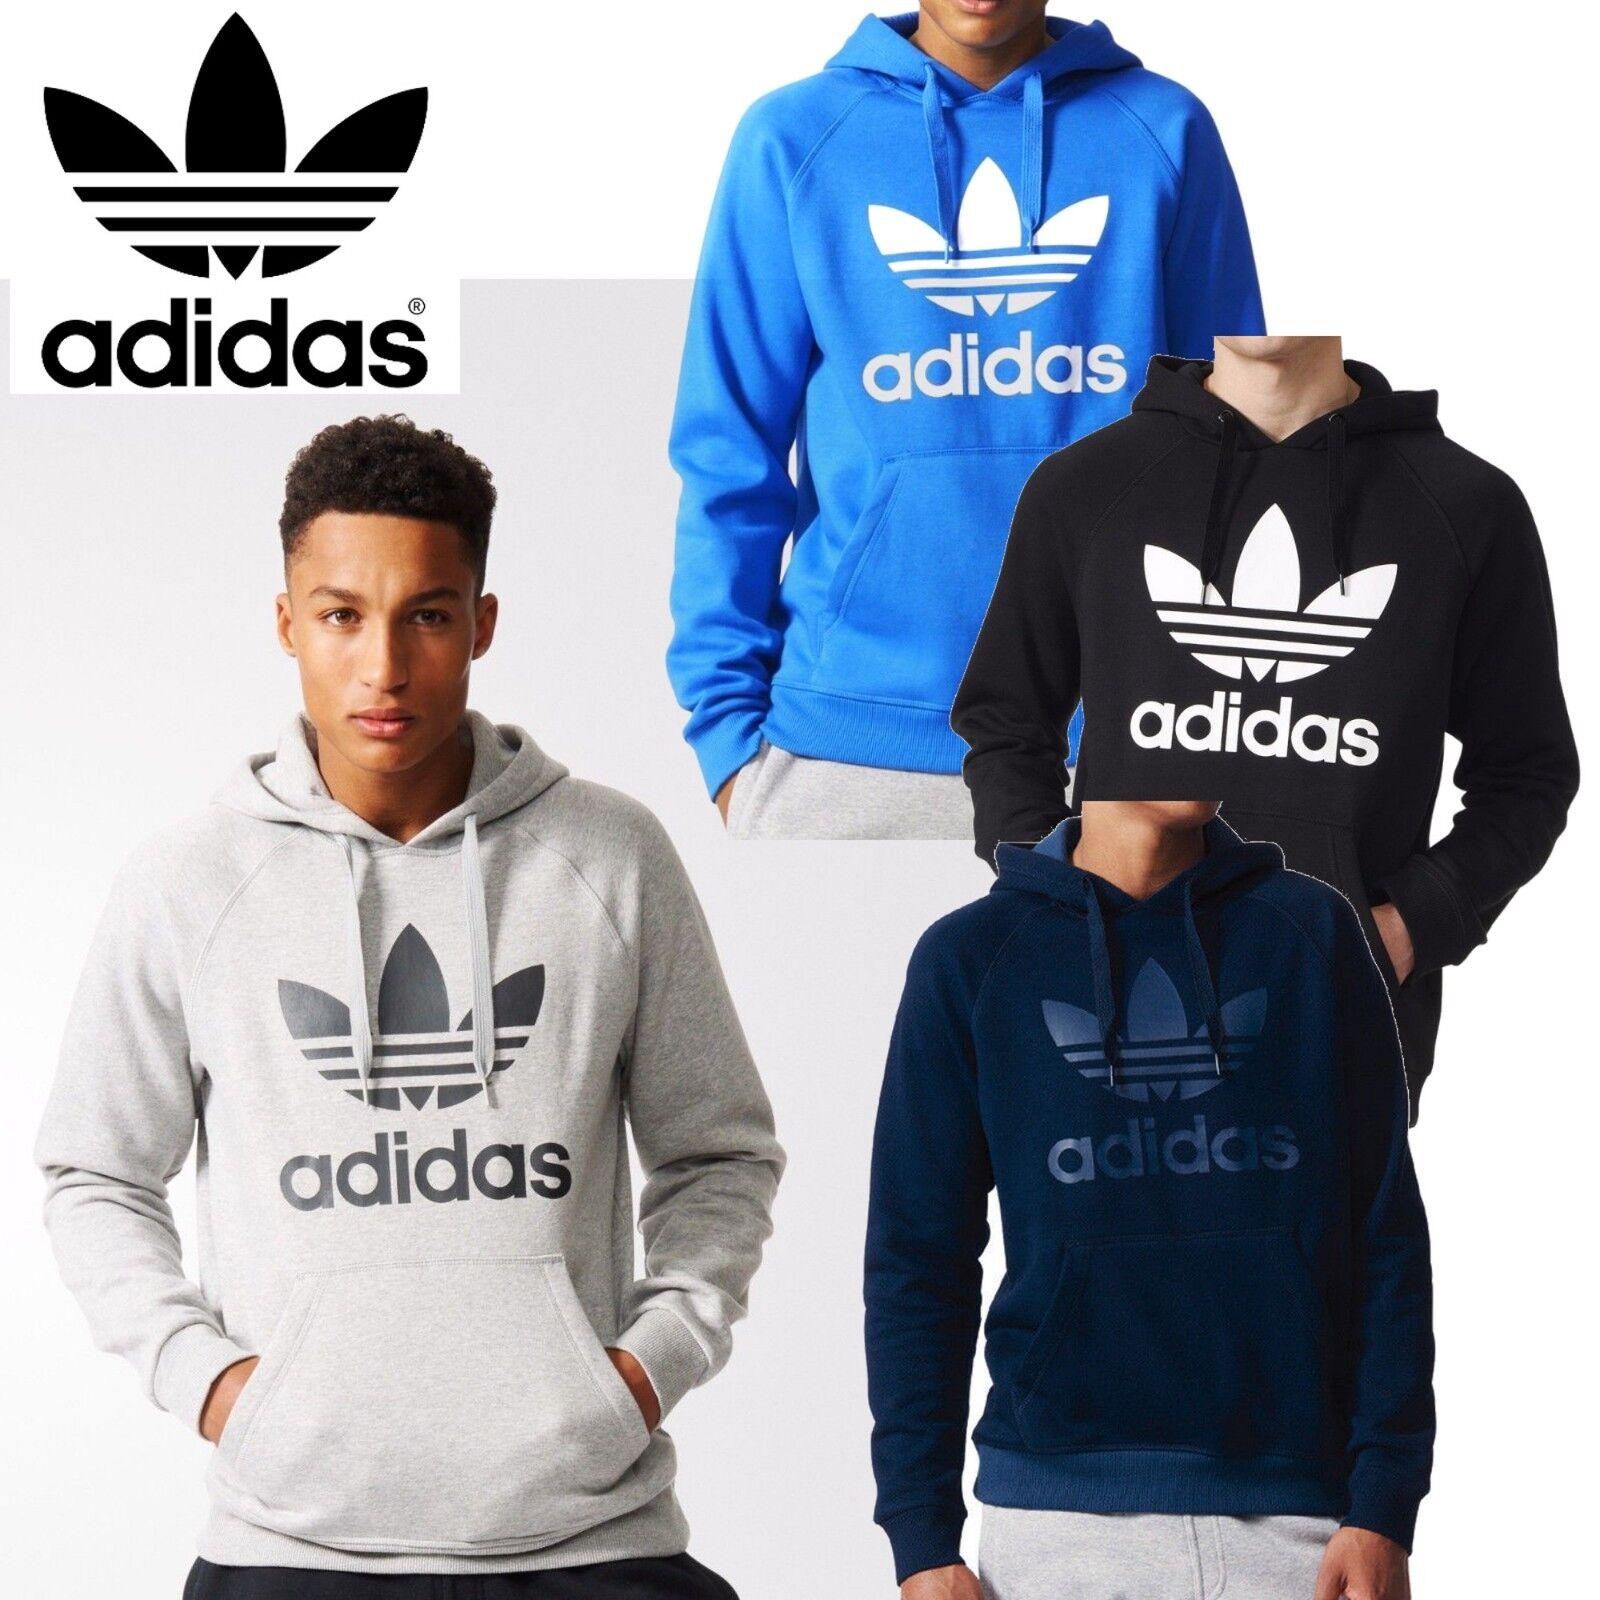 c7c018964b22 adidas Originals Trefoil Hoodies Mens Sweatshirt Hooded Jumper Sports Tops